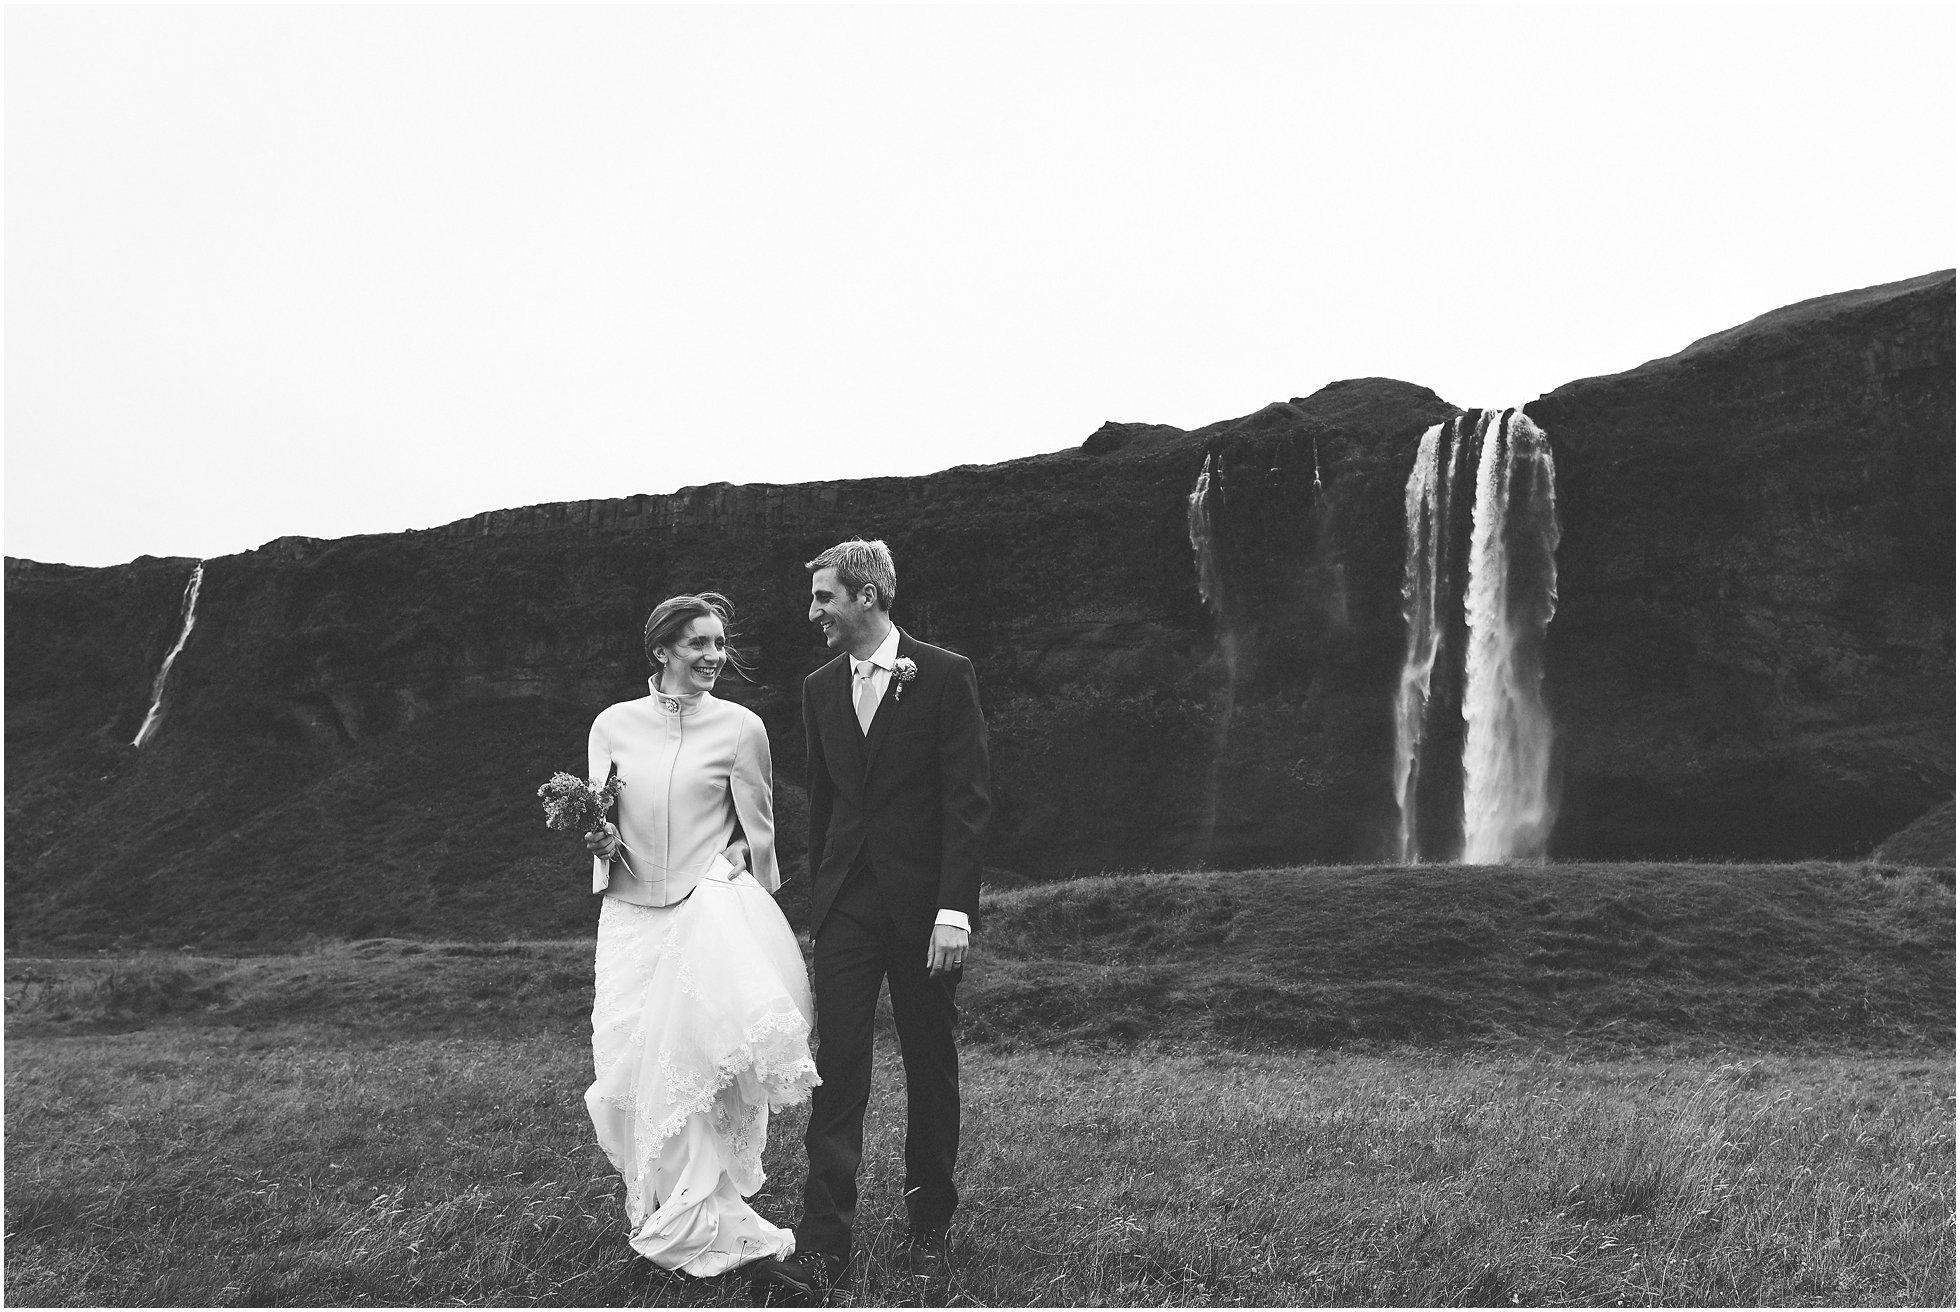 Bride and groom walking away from Seljalandsfoss